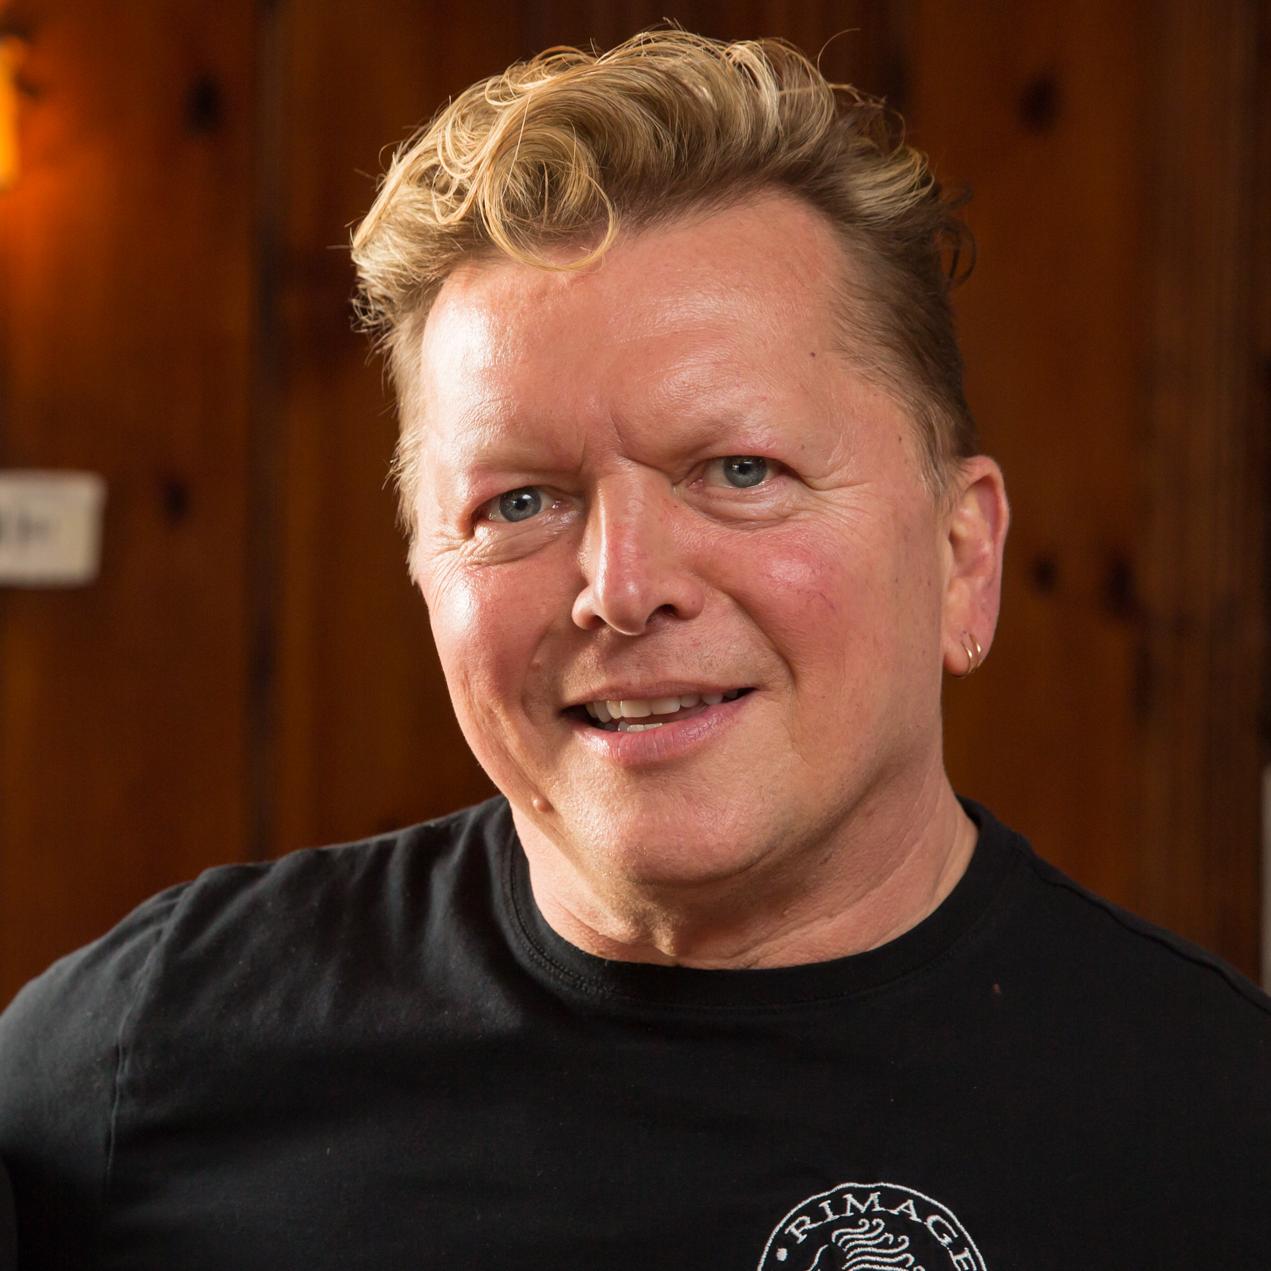 Len Yanavich, Hair Designer